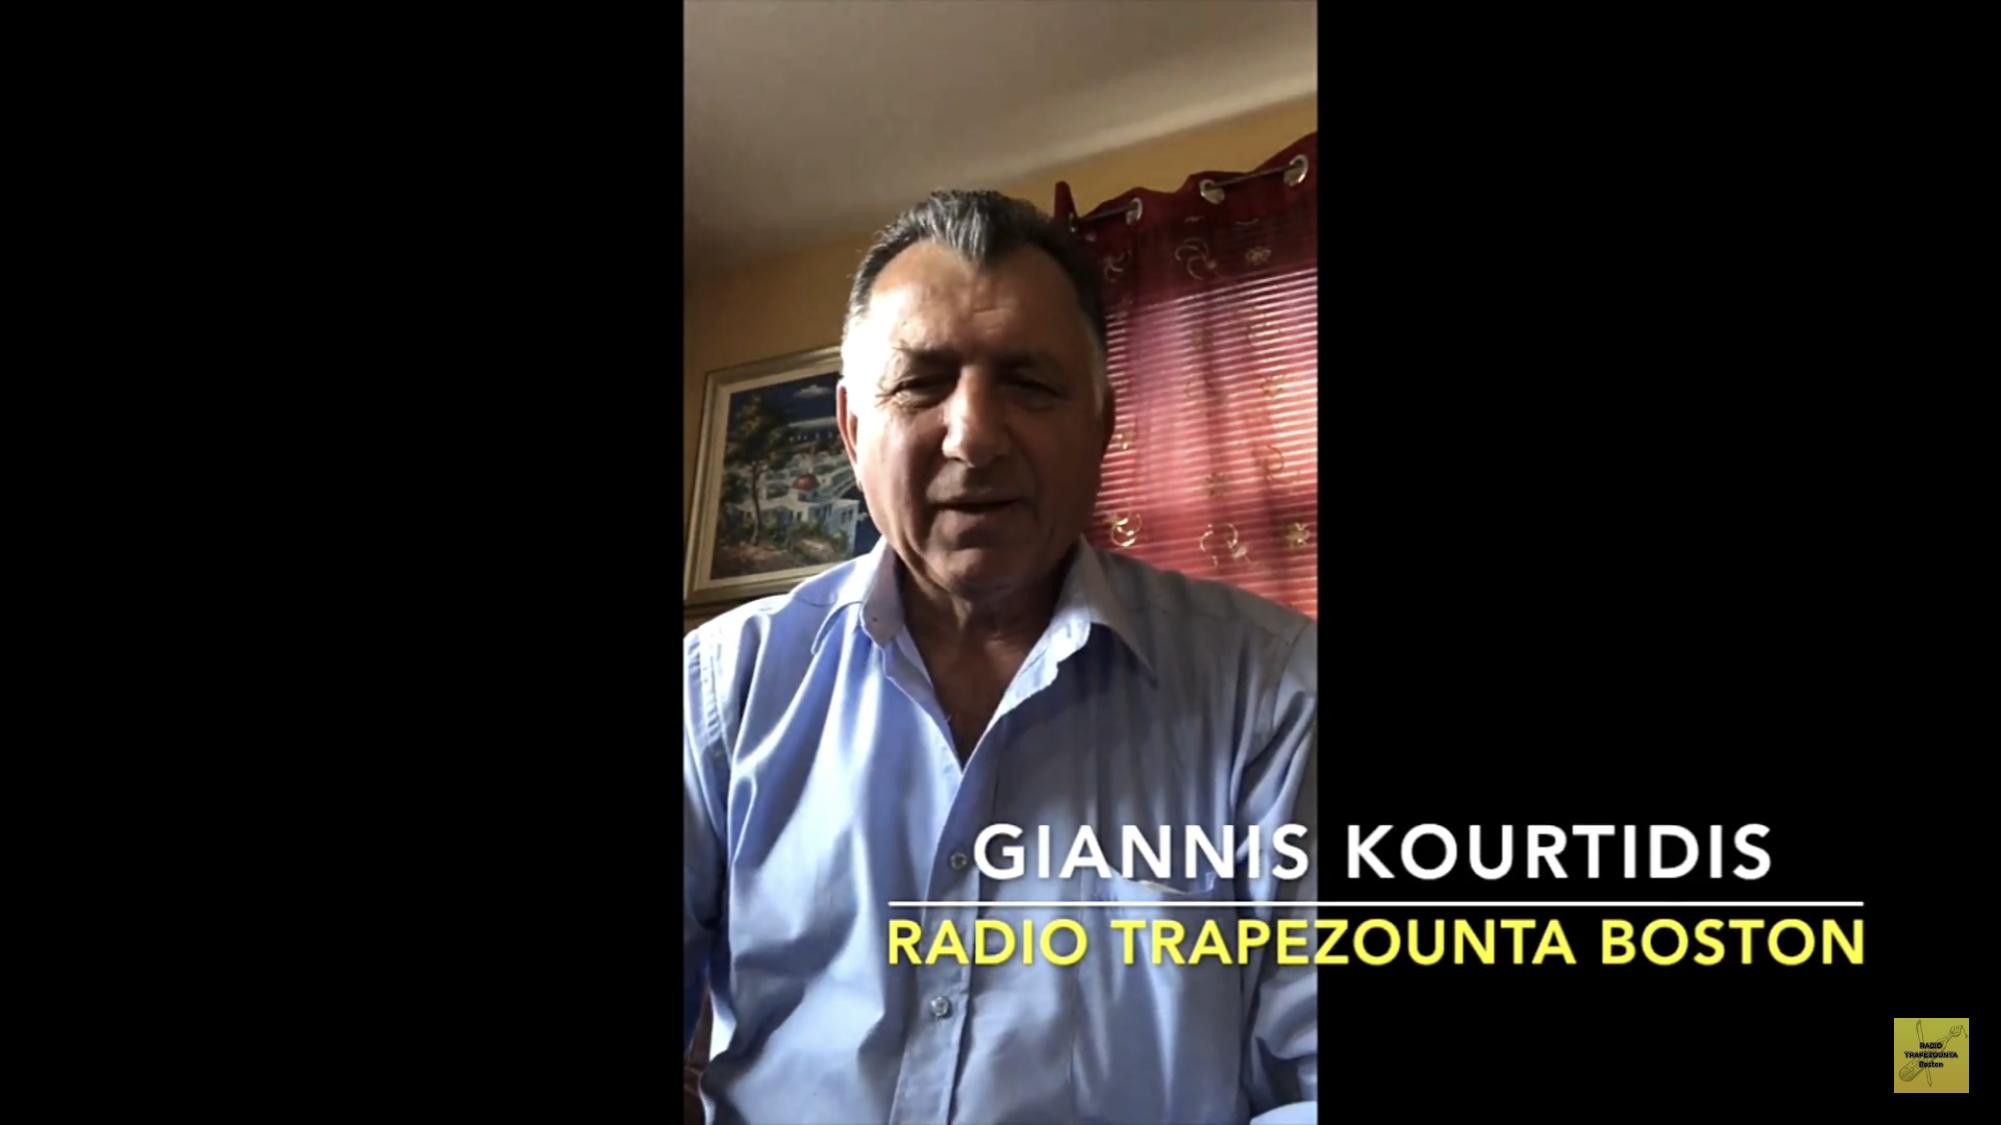 Giannis Kourtidis – Γιάννης Κουρτίδης